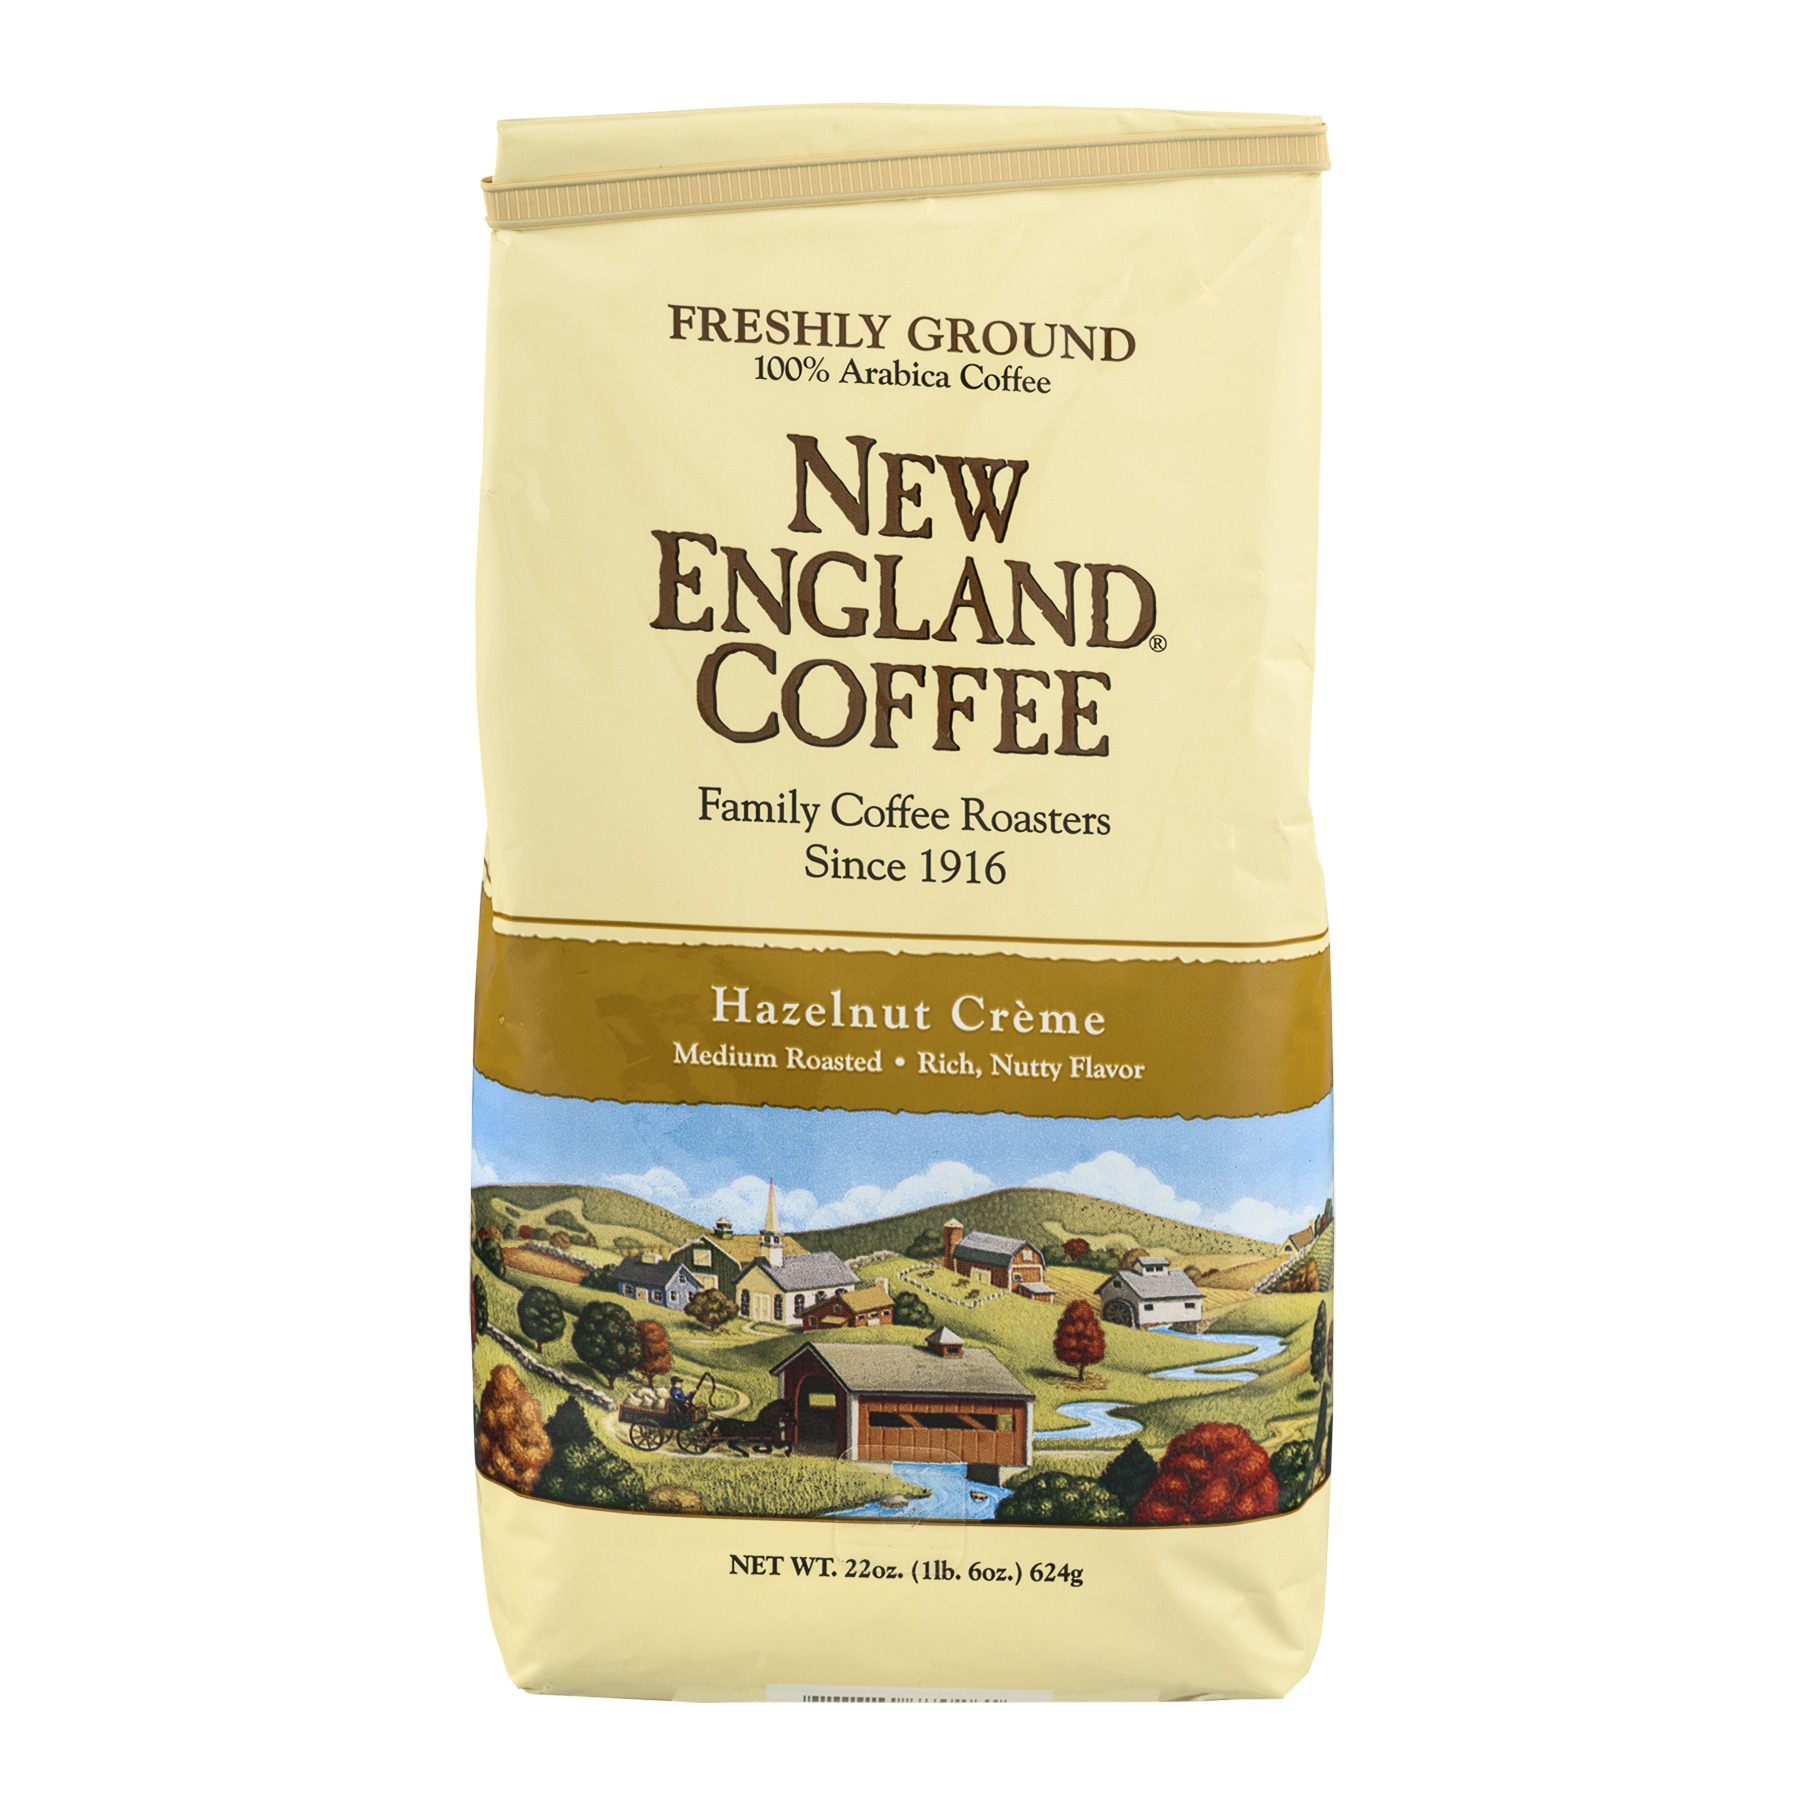 New England Coffee Hazelnut Crème Medium Roast Freshly Ground, 22.0 OZ